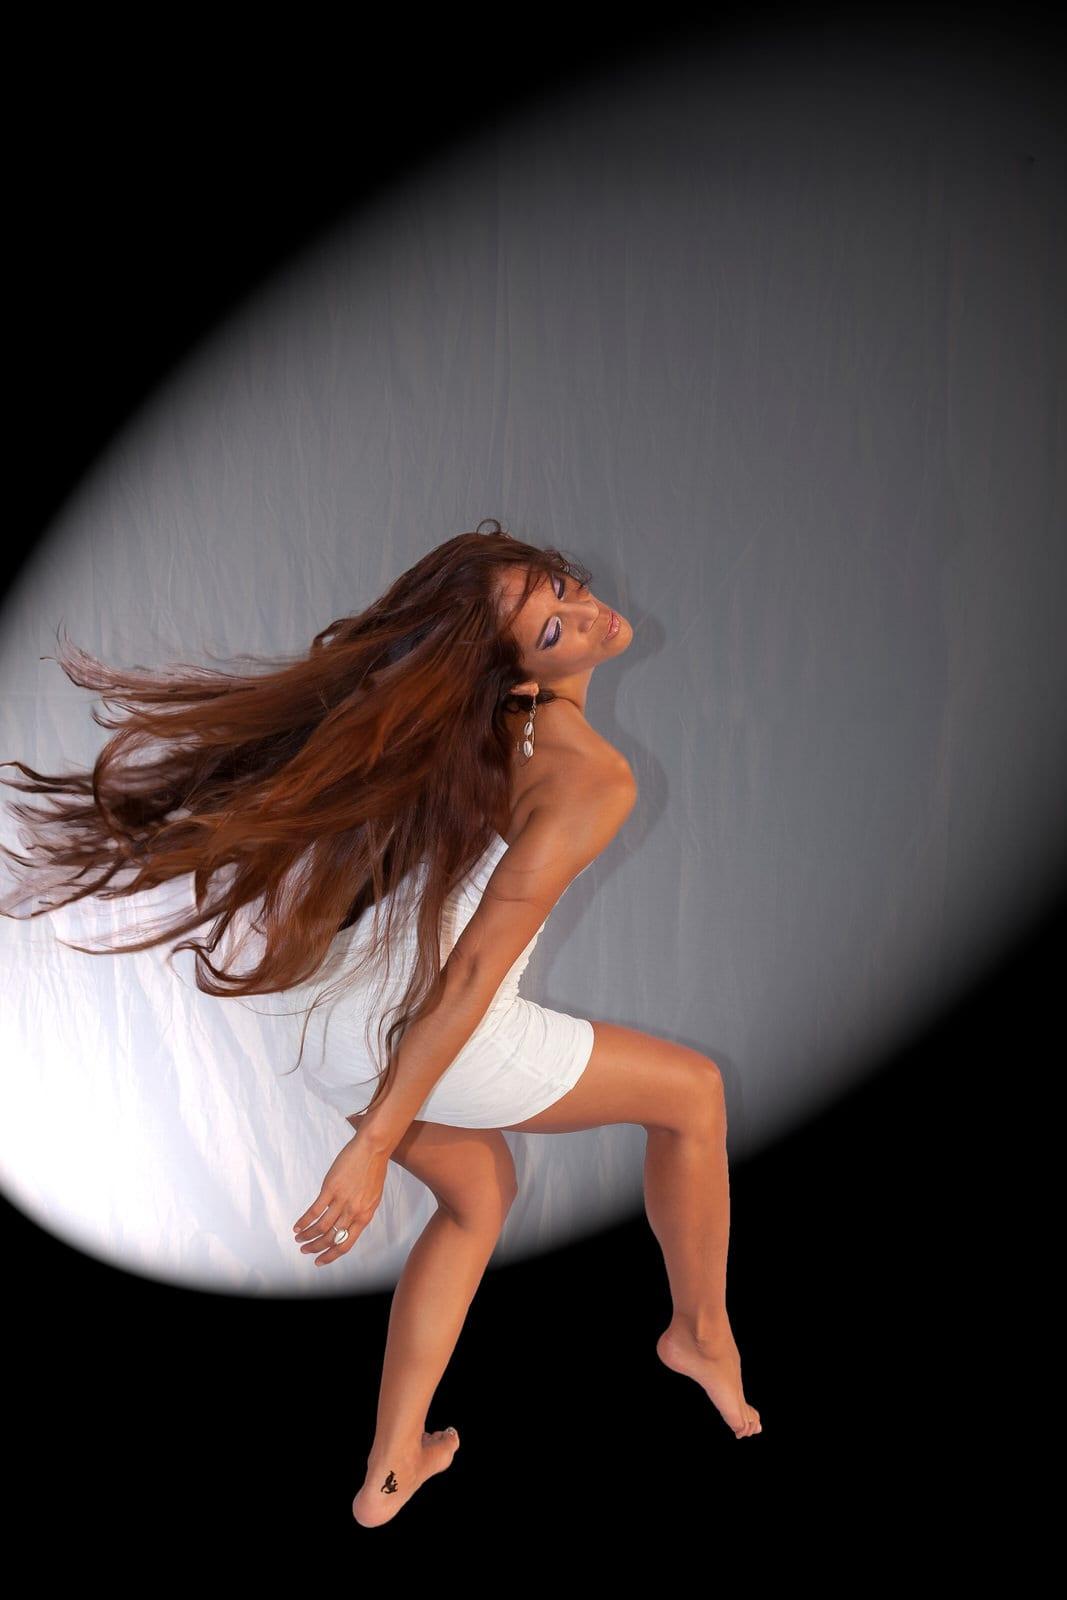 Michal-step-spotlight-dancer-photographer-Hawaii.jpg